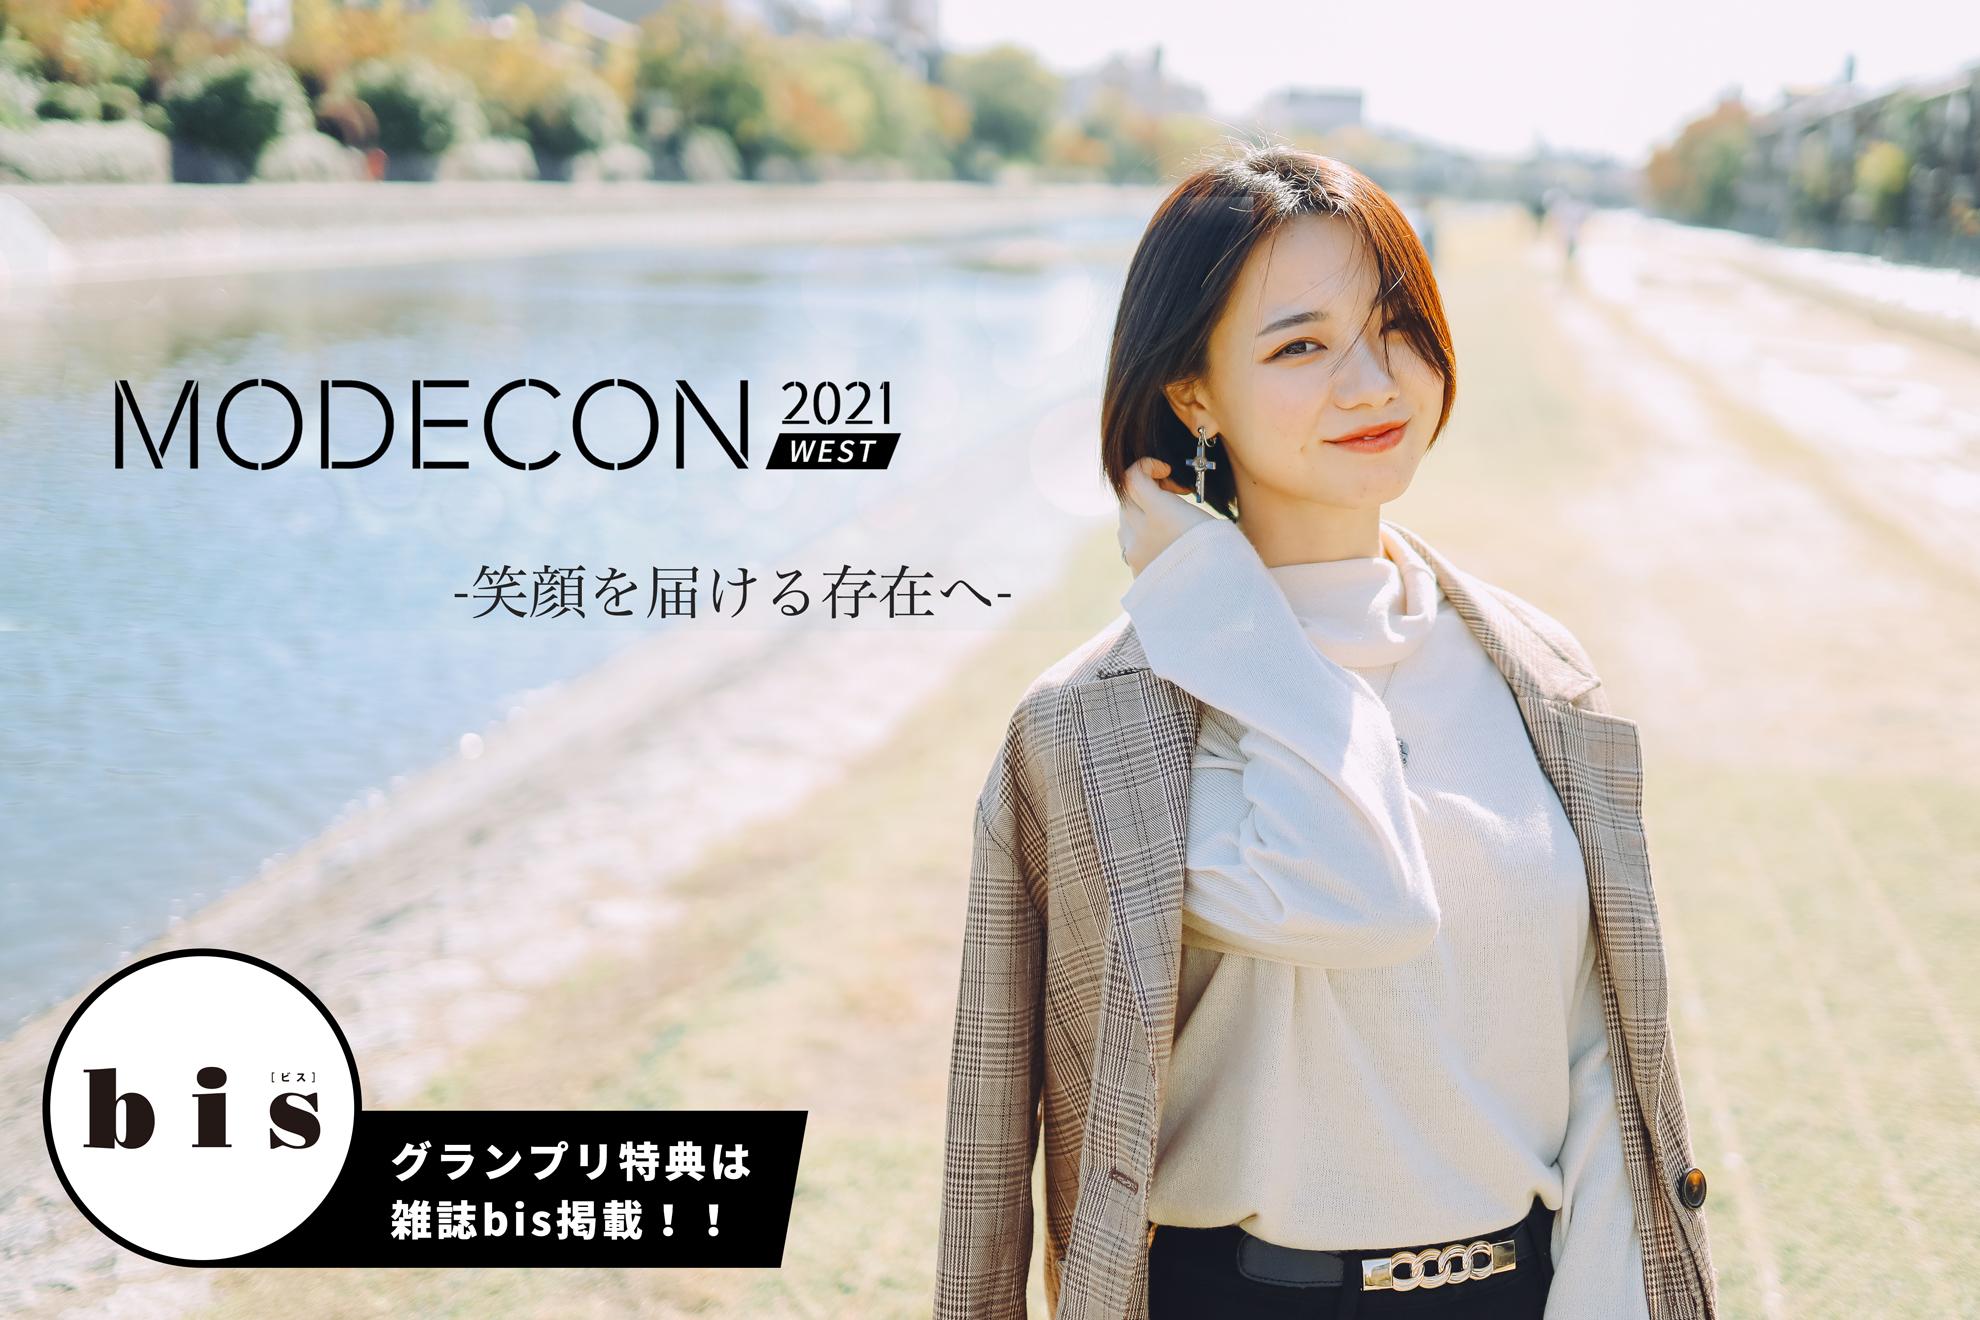 MODECON WEST 2021